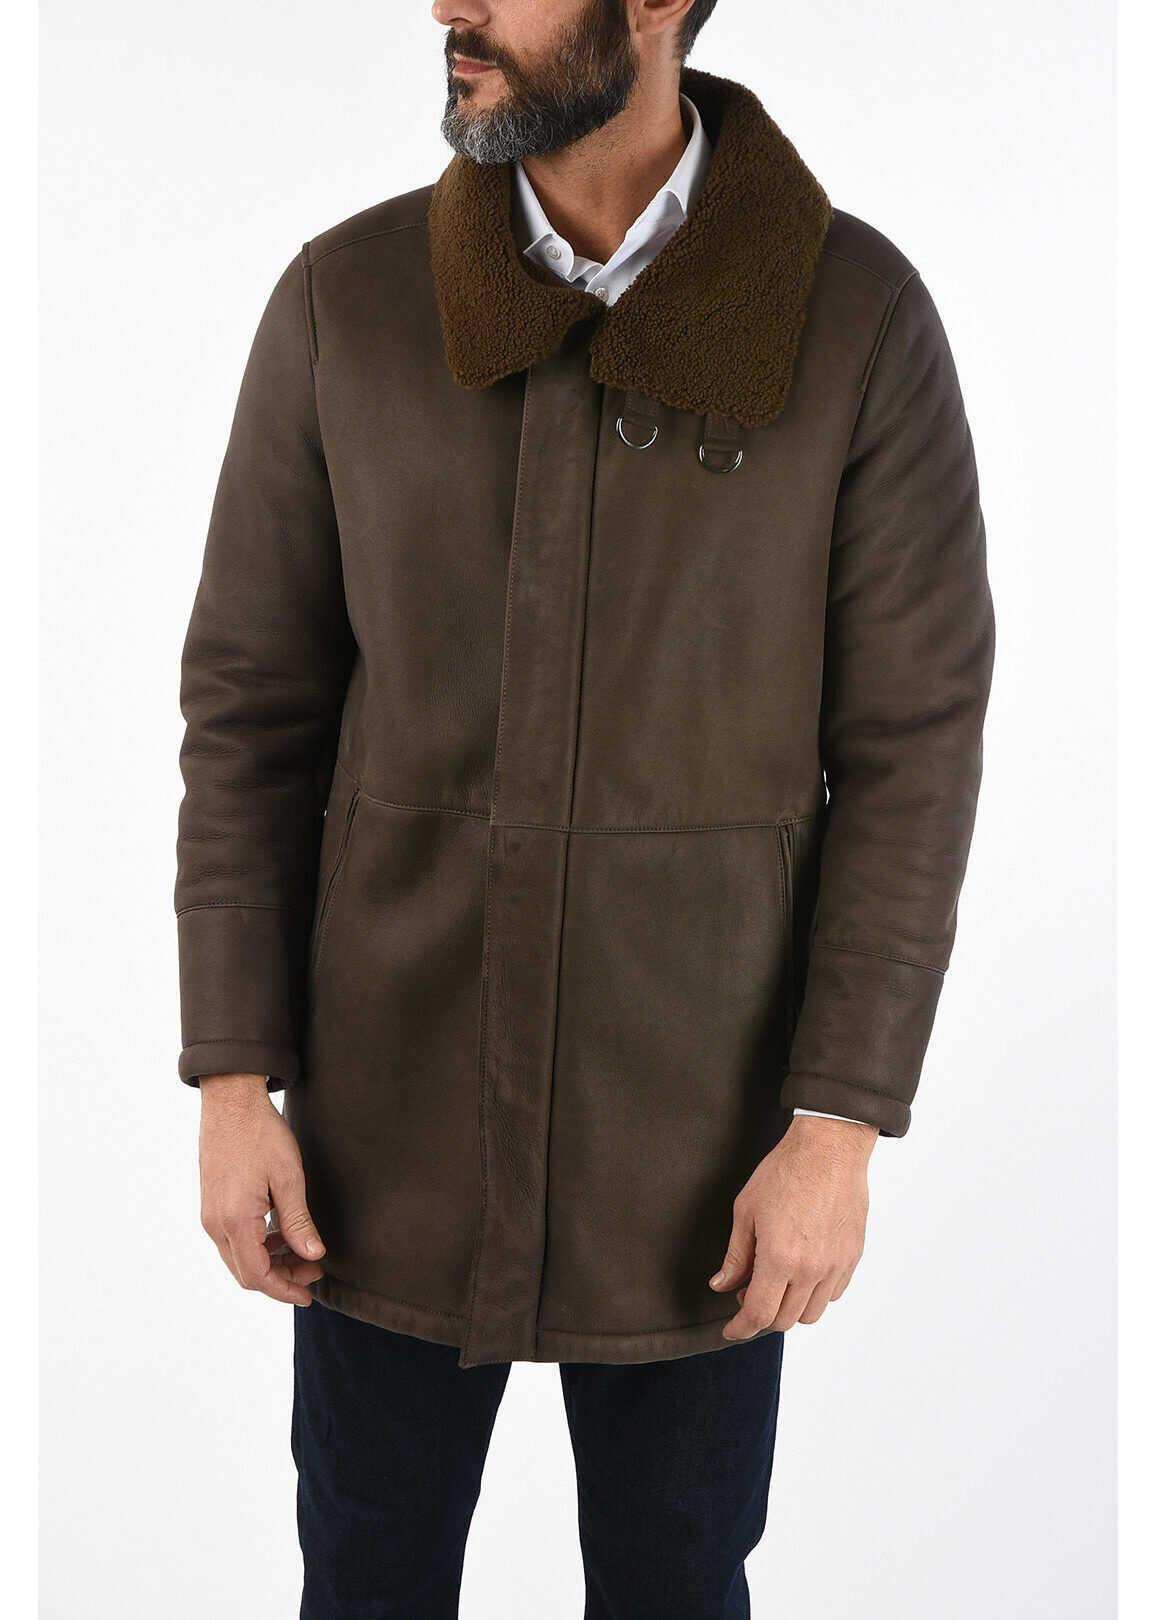 CORNELIANI ID Shearling jacket BROWN imagine